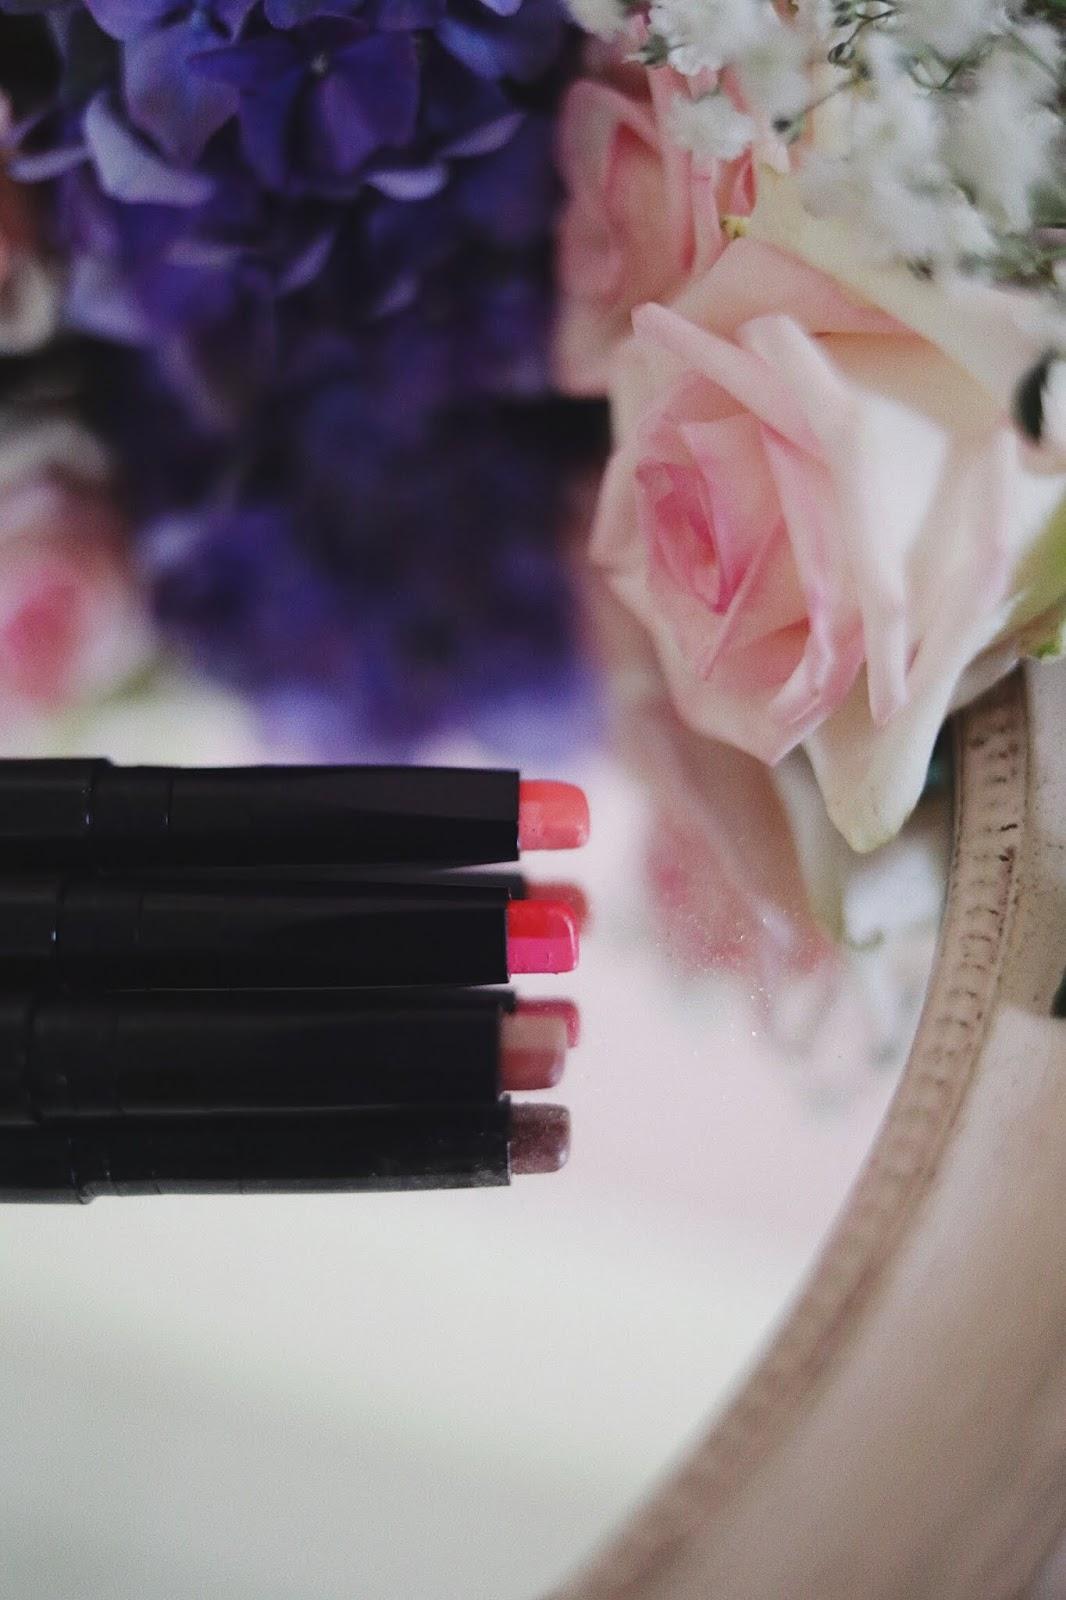 twist-on lip , by Terry , terry de gunzburg , 1 Peach & Tangerine , 4 Candy & Poppy , 7 Latte & Toffee , ombré-lip , revue , avis , paris , blog beauté , rosemademoisellen rose mademoiselle ,